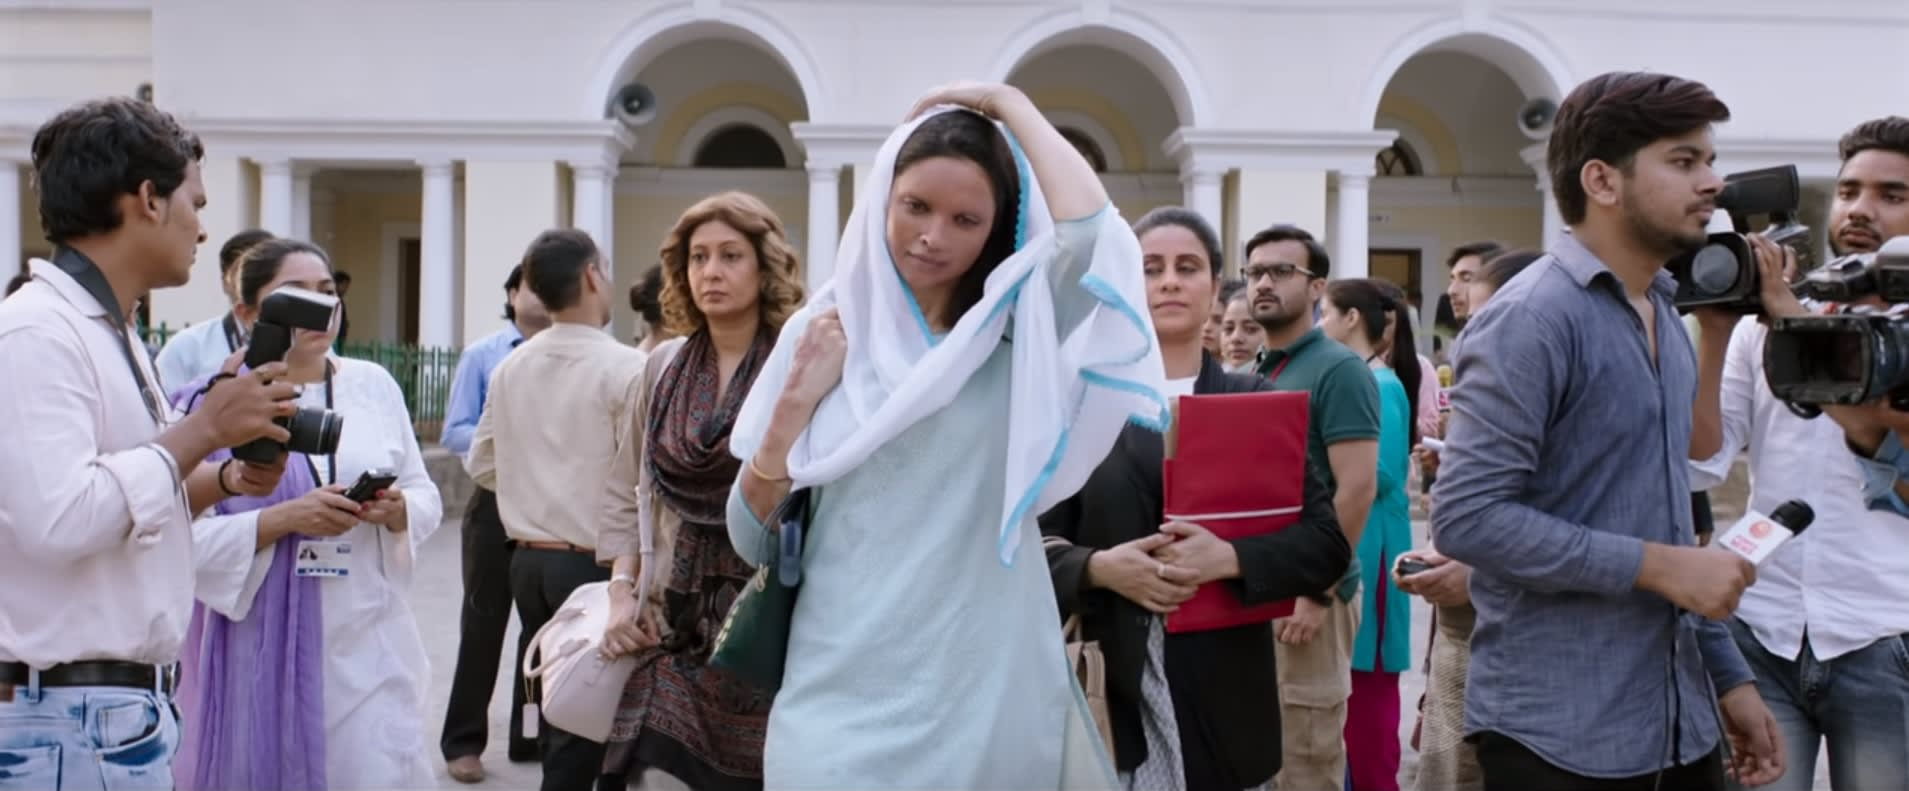 chapak full movie download in 720p filmyzila